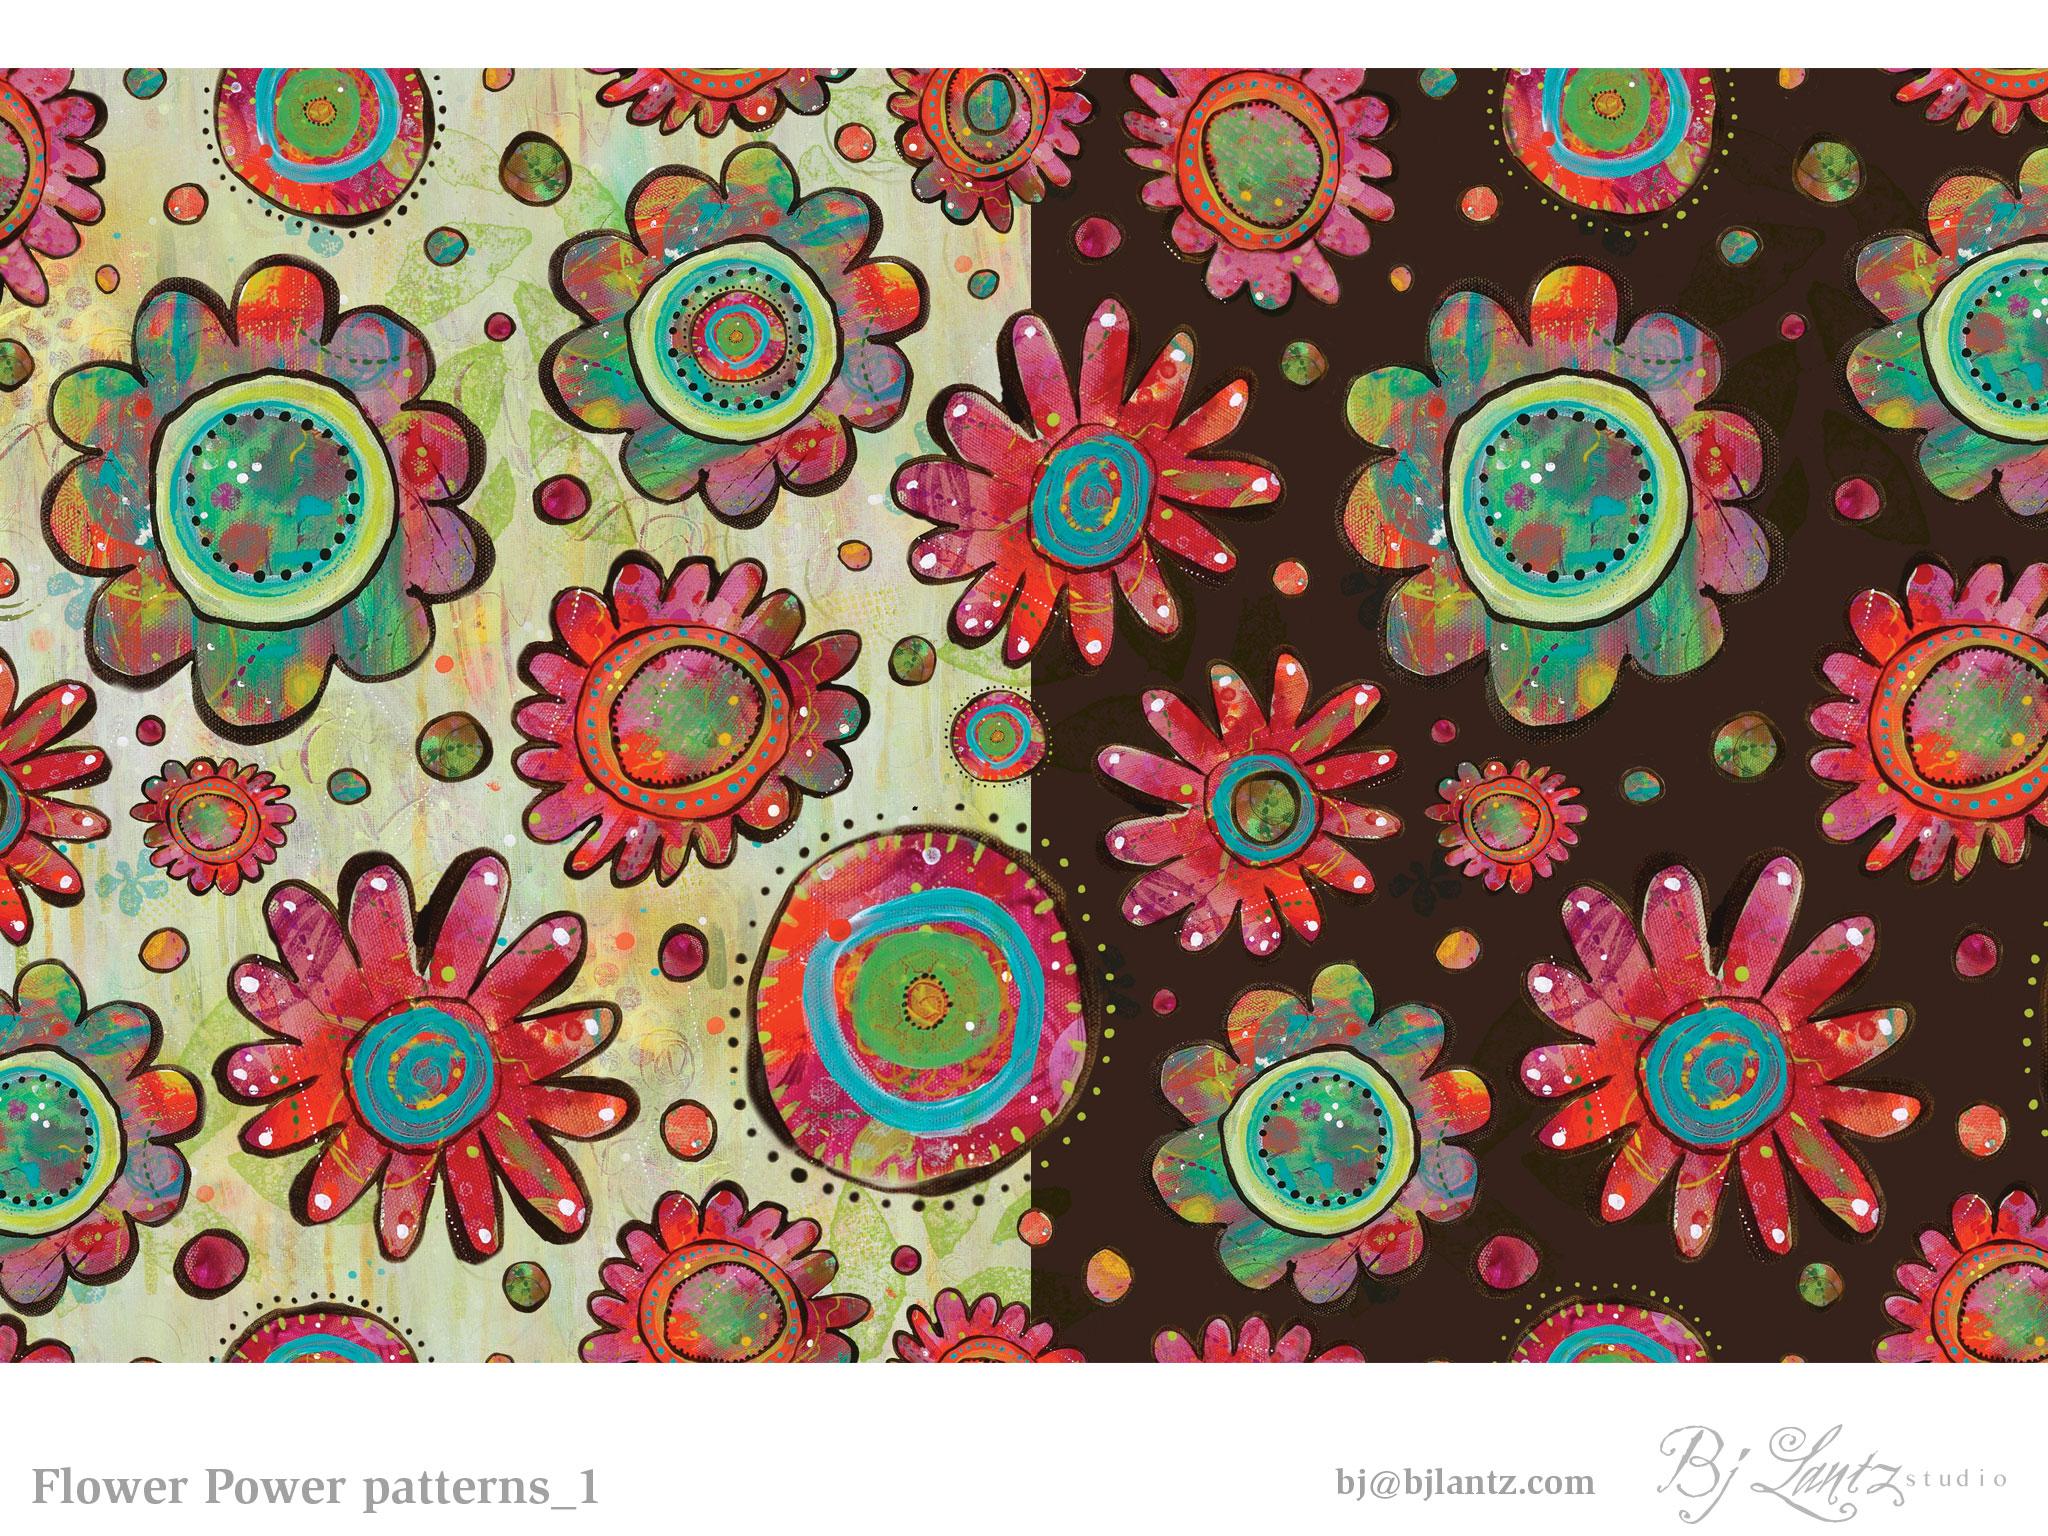 FlowerPower_BJLantz_6.jpg